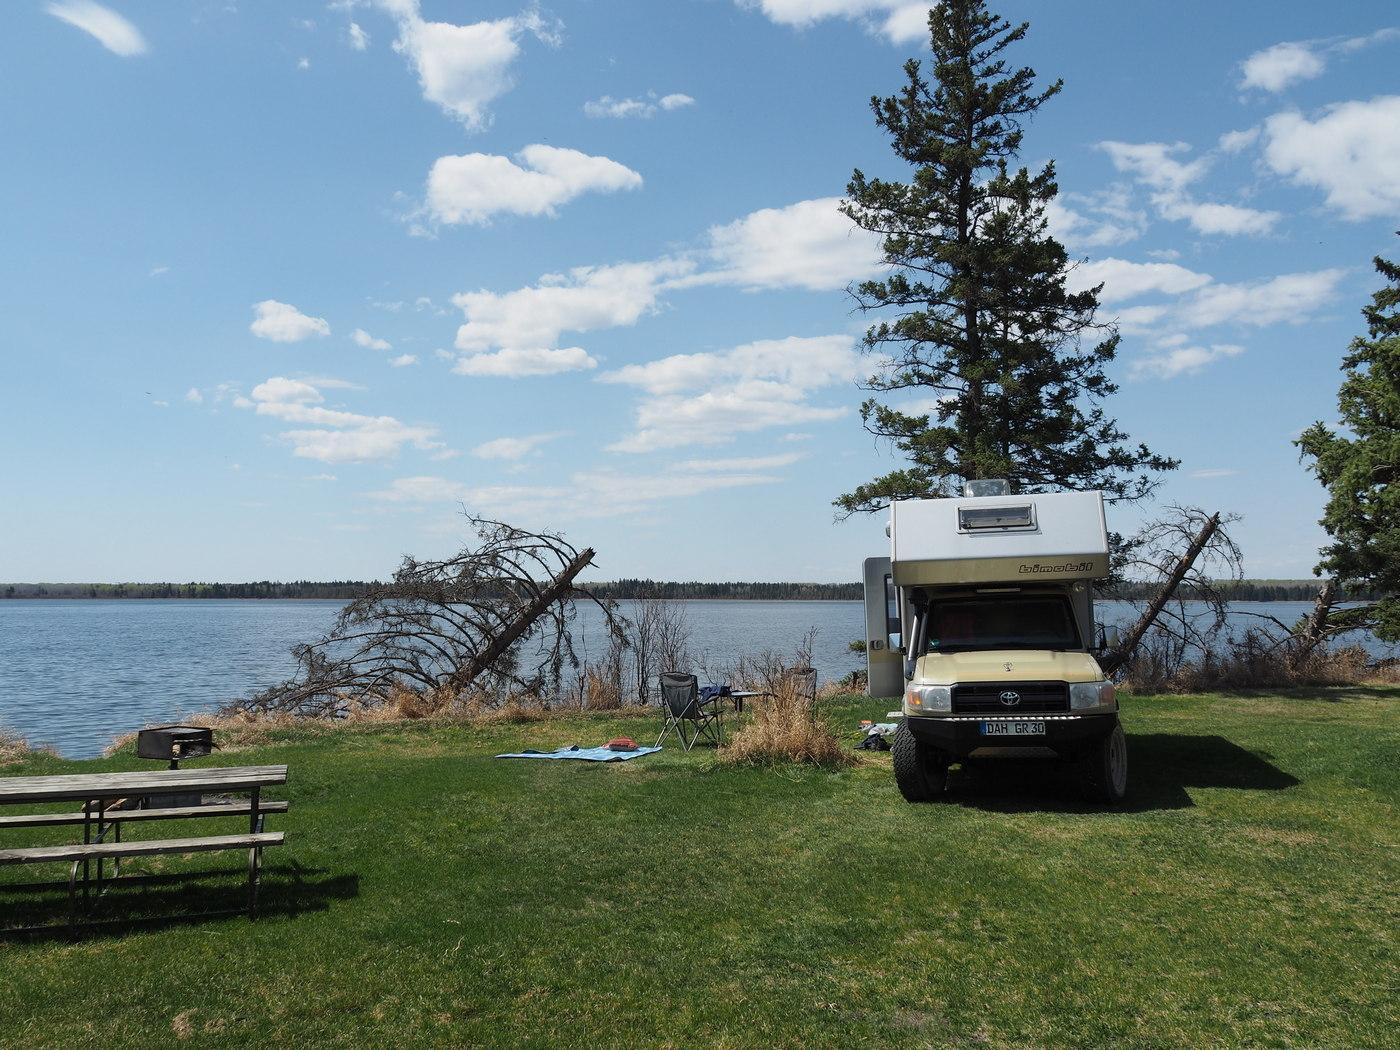 Traumplatz am Lake Audy